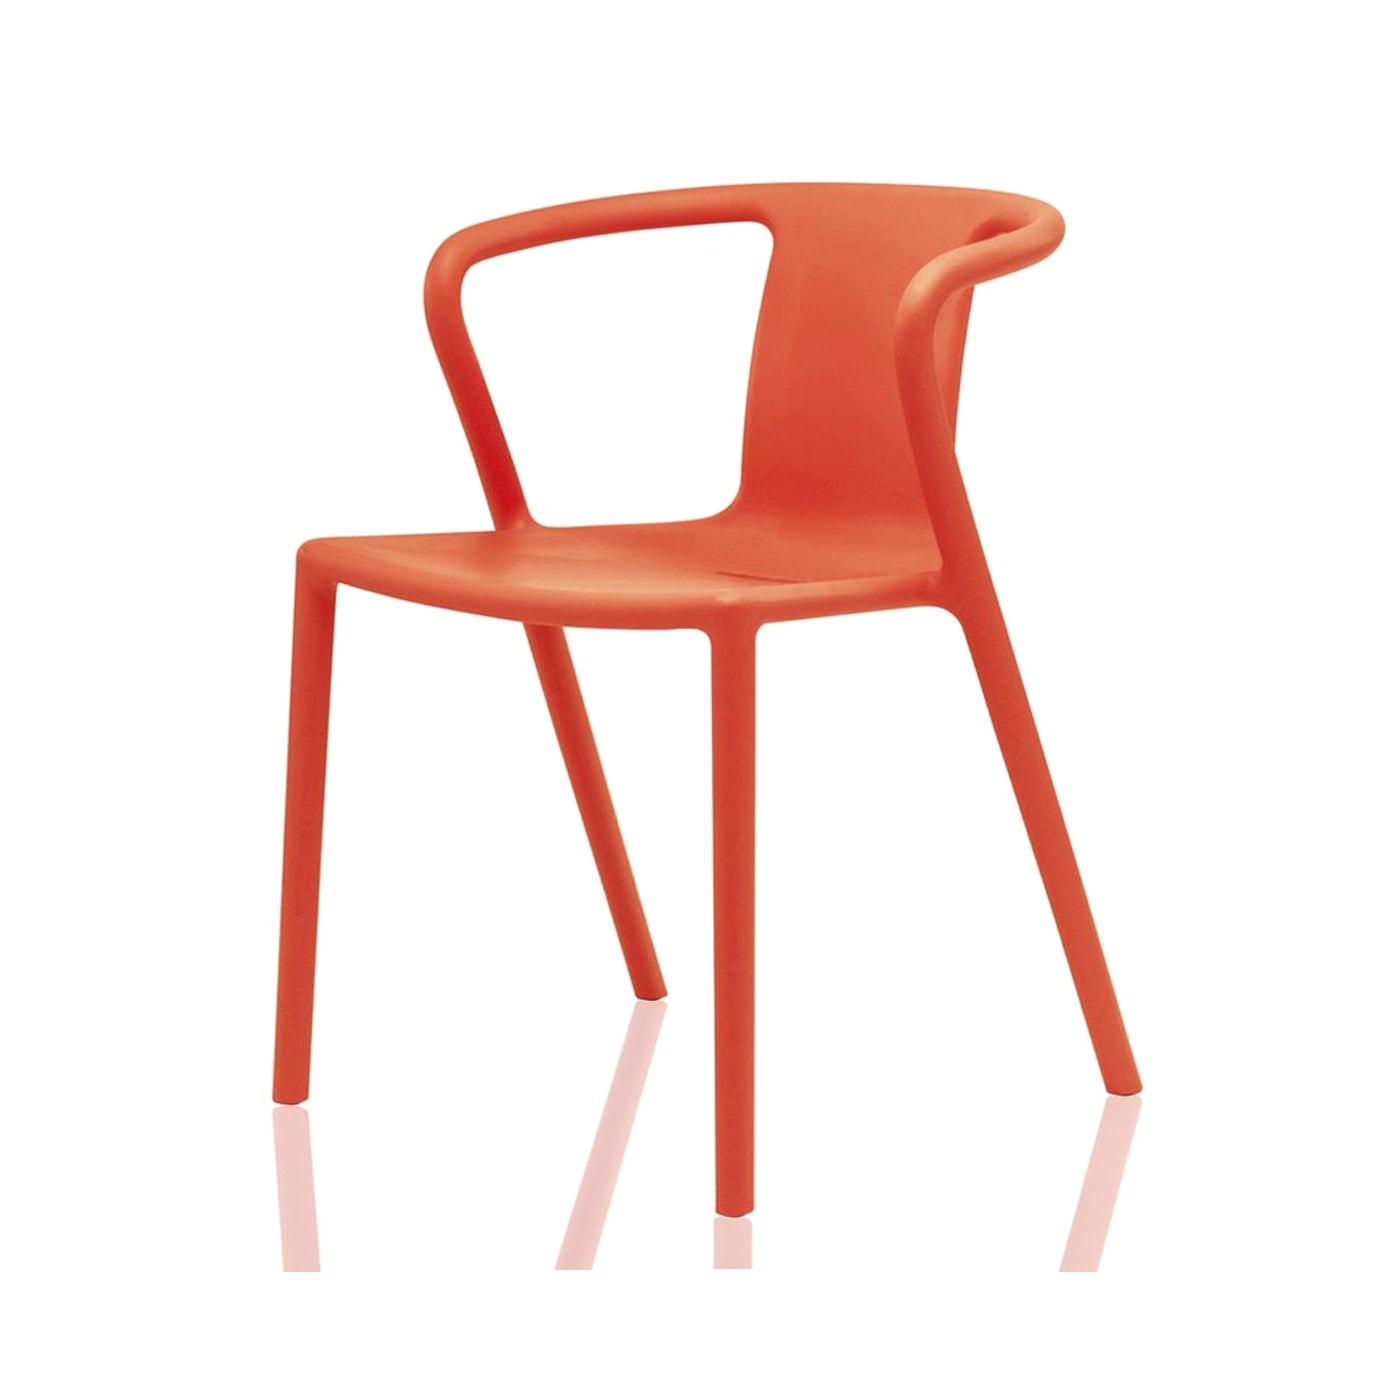 Magis Air-Armchair sedia - Della Chiara store